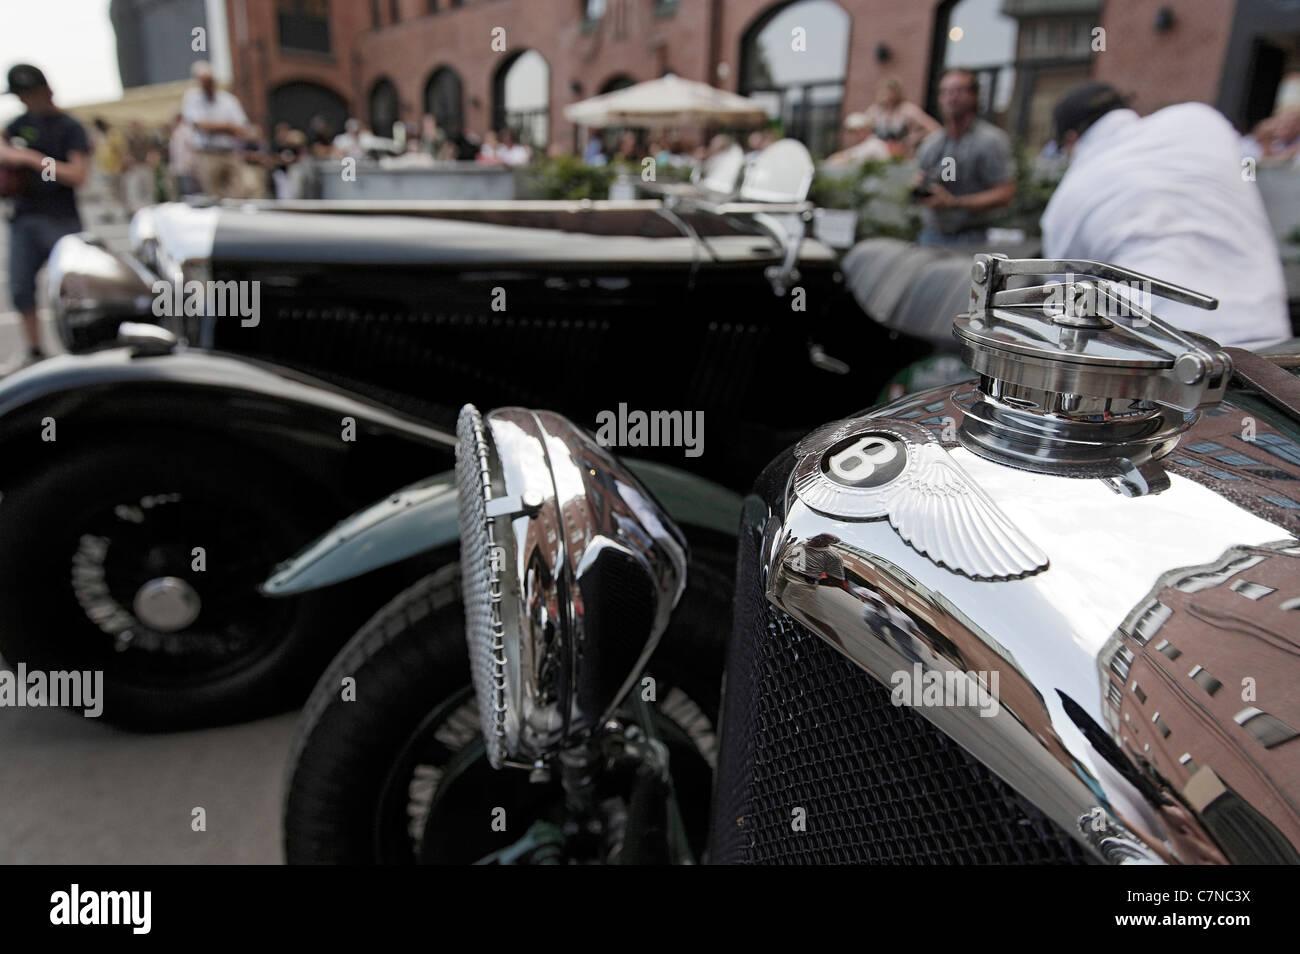 Two vintage BENTLEYs, Hamburg - Berlin KLASSIK rally, Prototyp Museum Hamburg, Hafencity district, Hamburg, Germany, - Stock Image